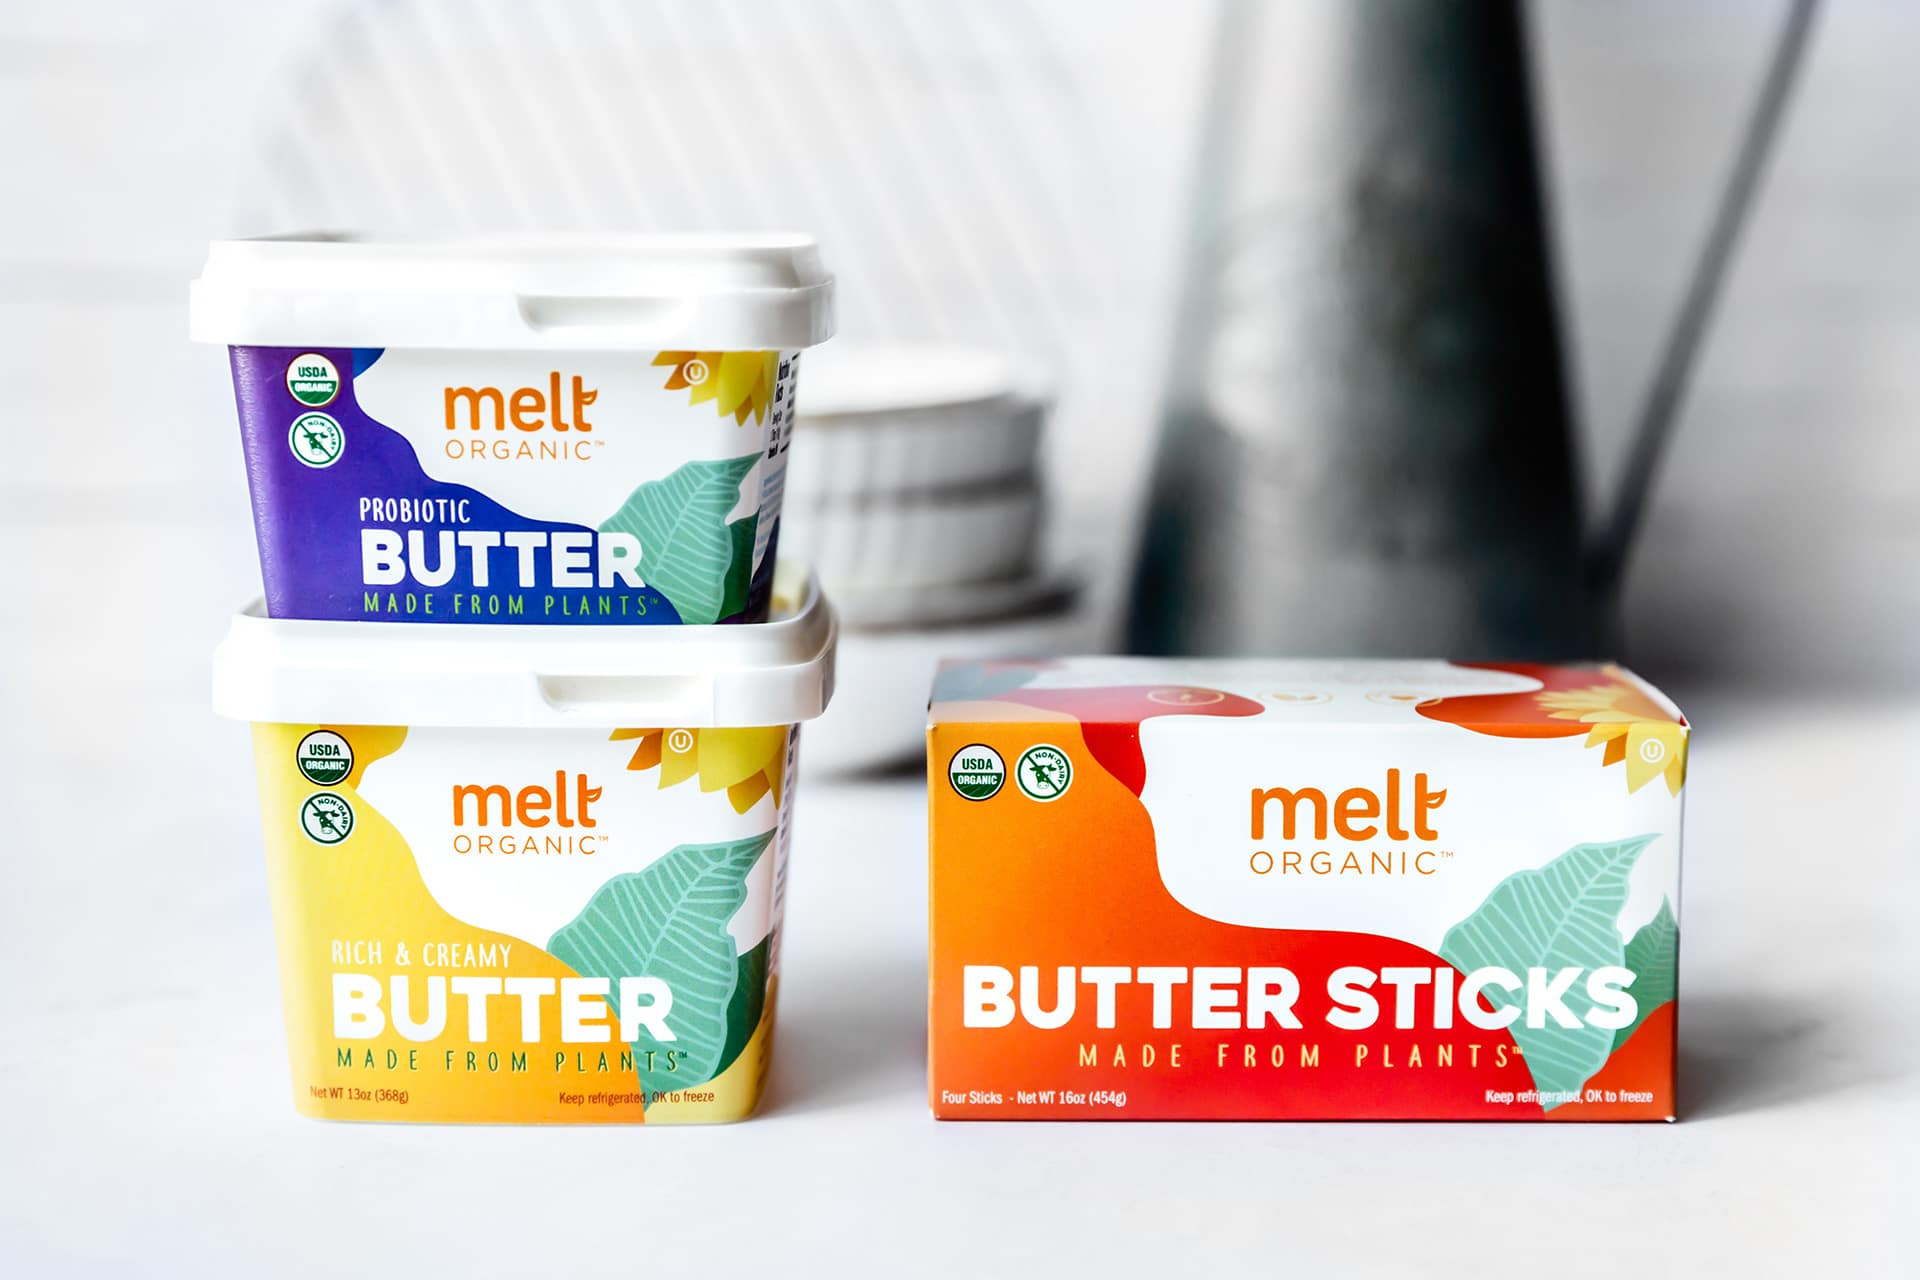 Melt Organic Unveils Unsalted Butter Sticks Made from Plants